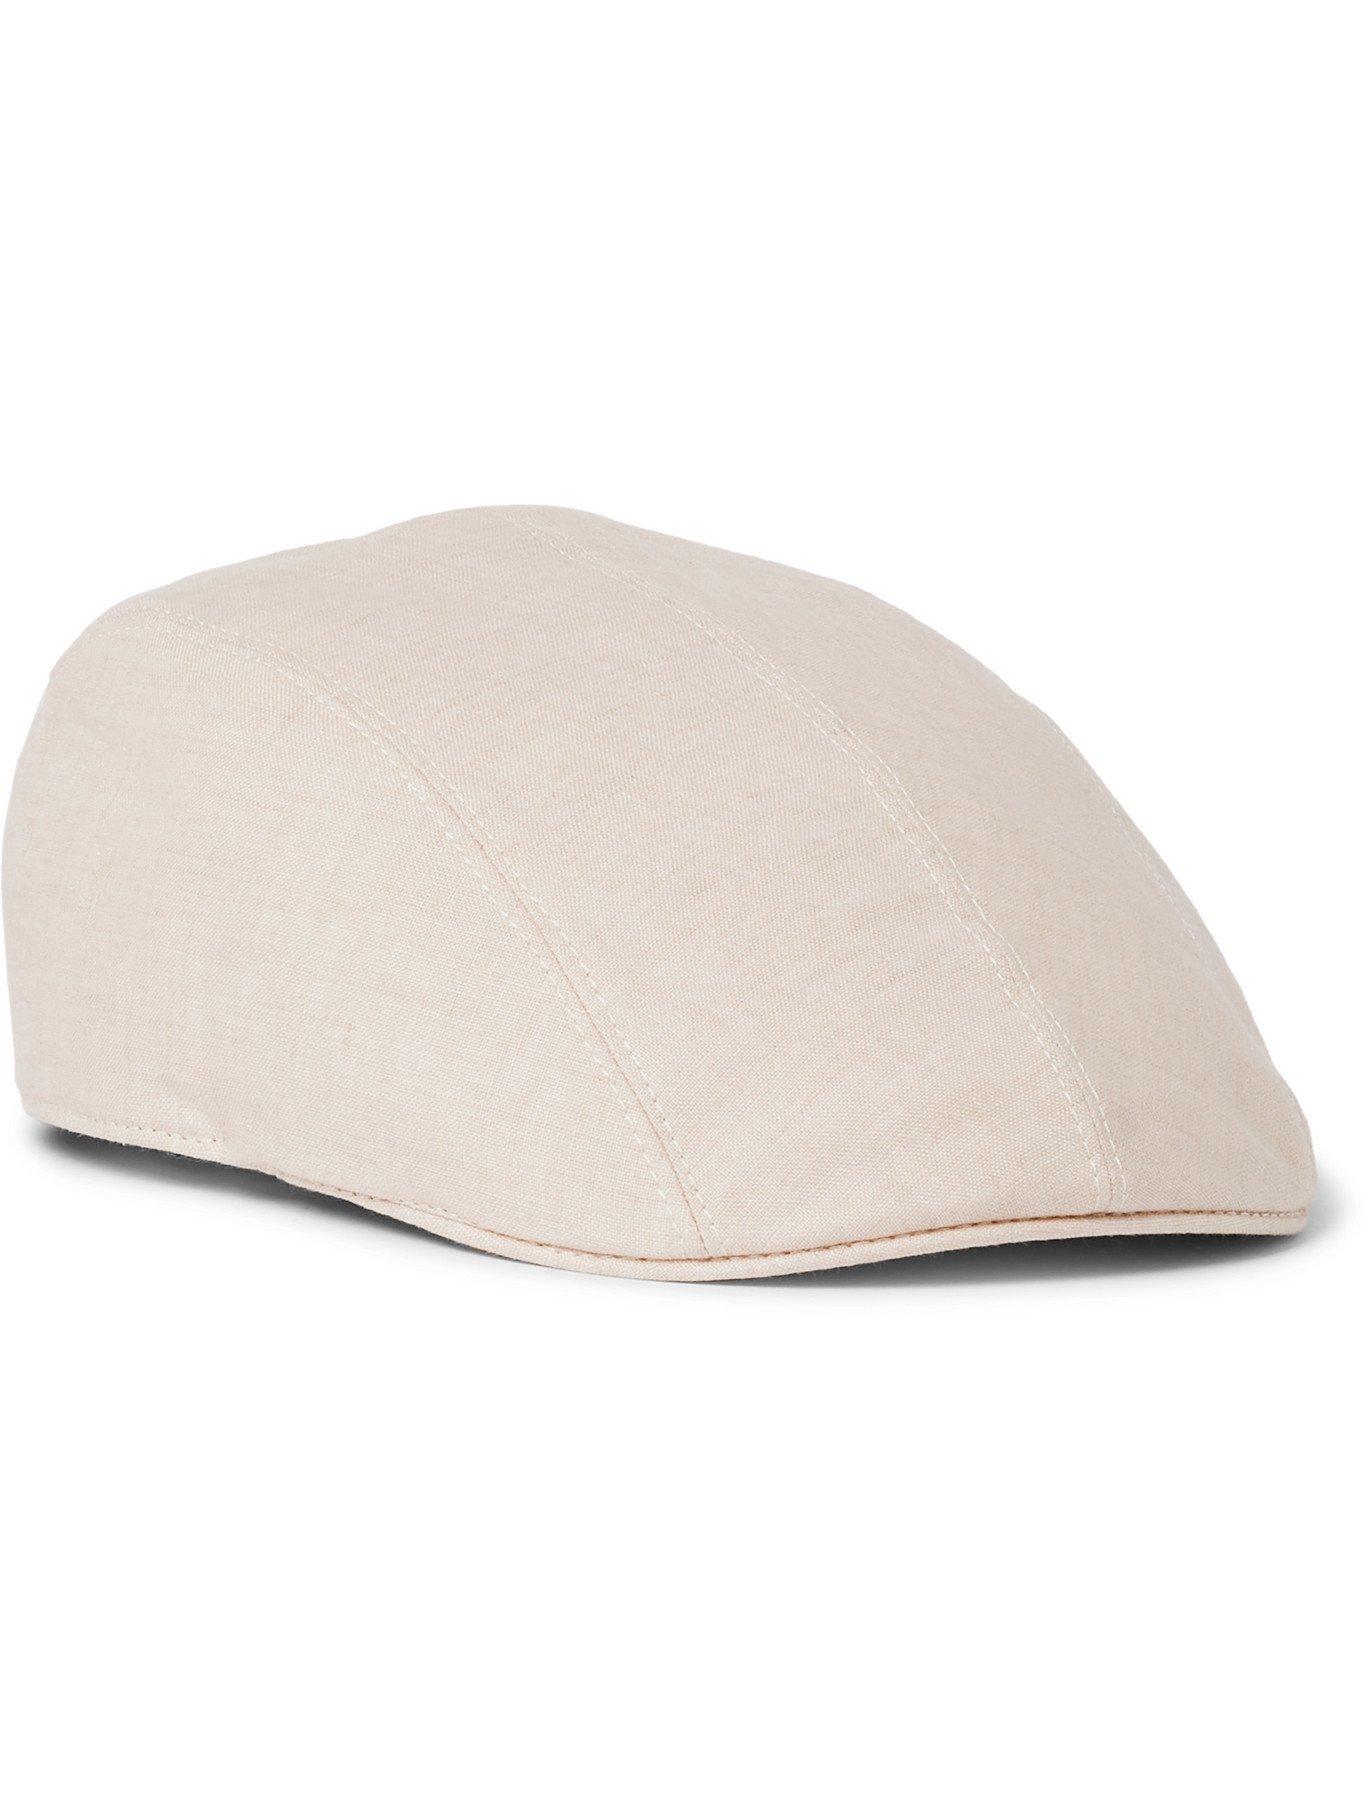 Photo: BRUNELLO CUCINELLI - Leather-Trimmed Linen Flat Cap - Neutrals